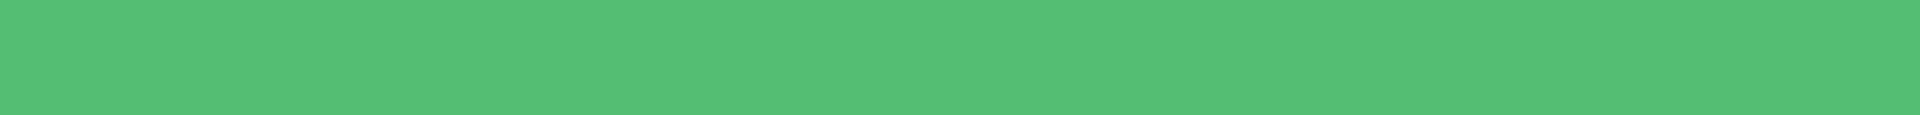 sep-green-top